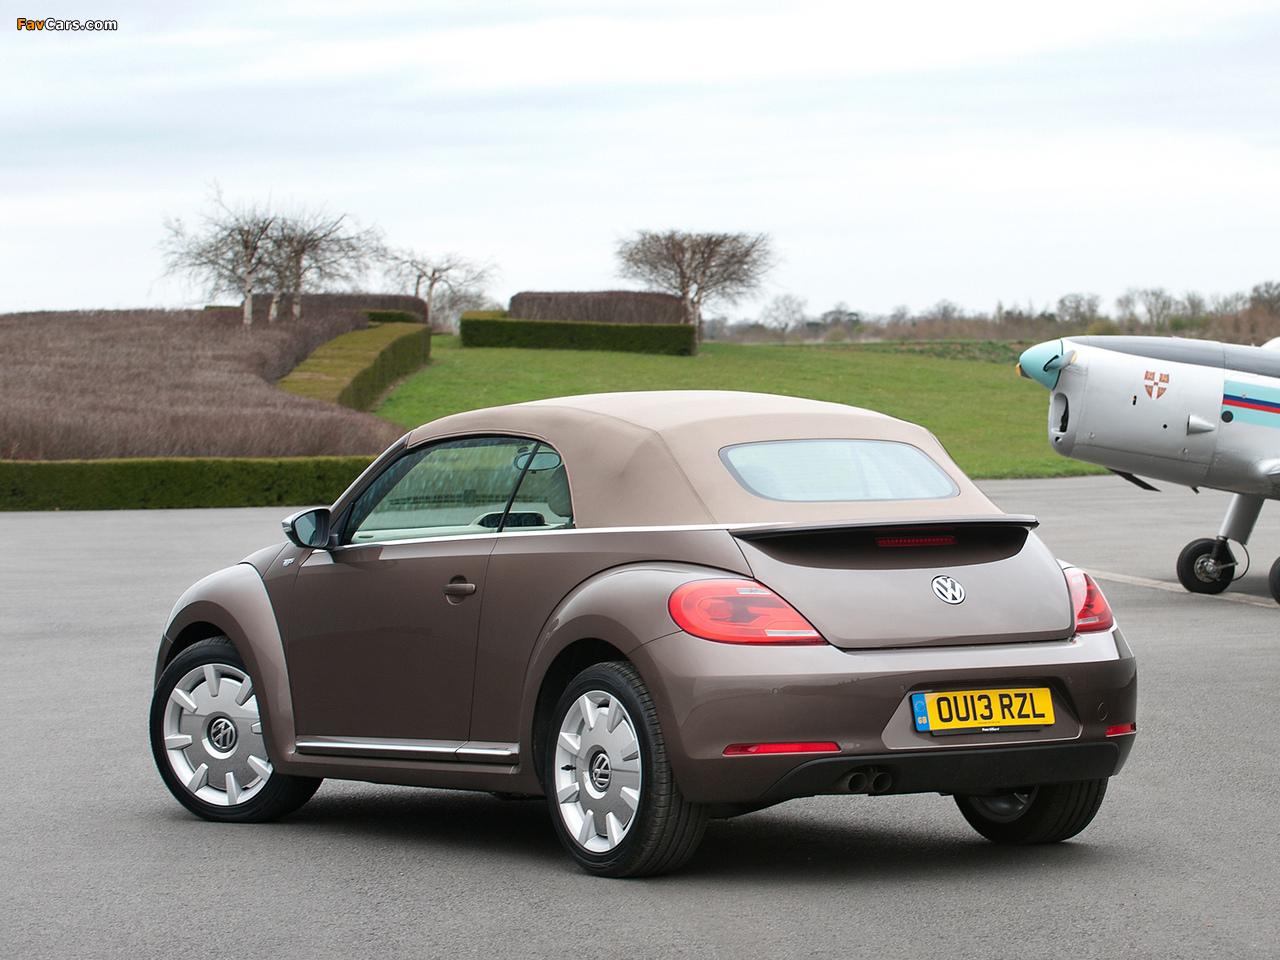 Volkswagen Beetle Cabrio 70s Edition UK-spec 2013 photos (1280 x 960)